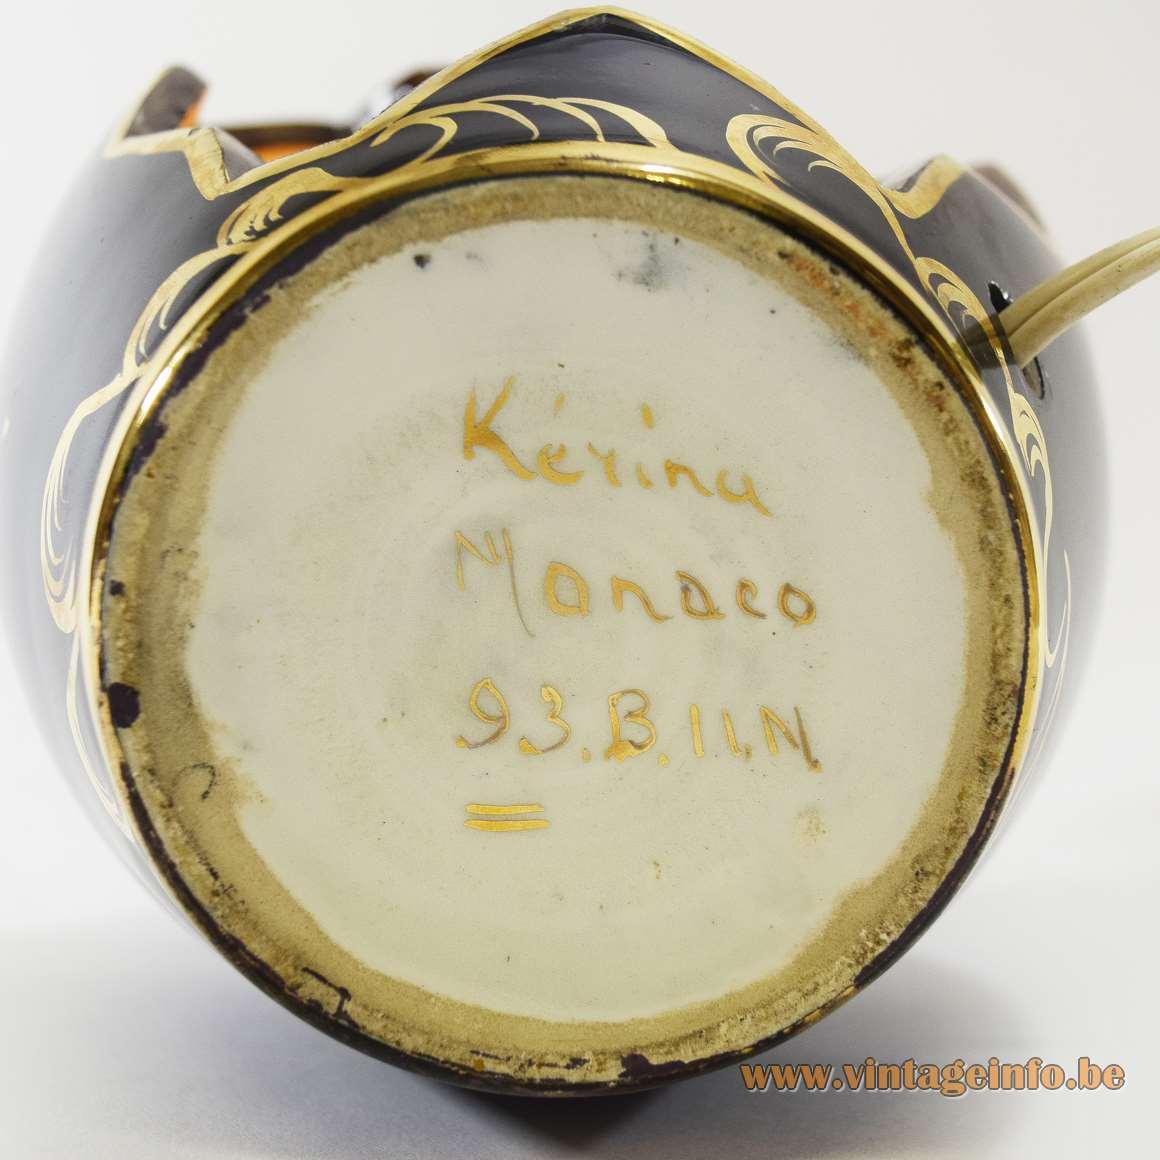 Kérina Monaco Table Lamp - Signature